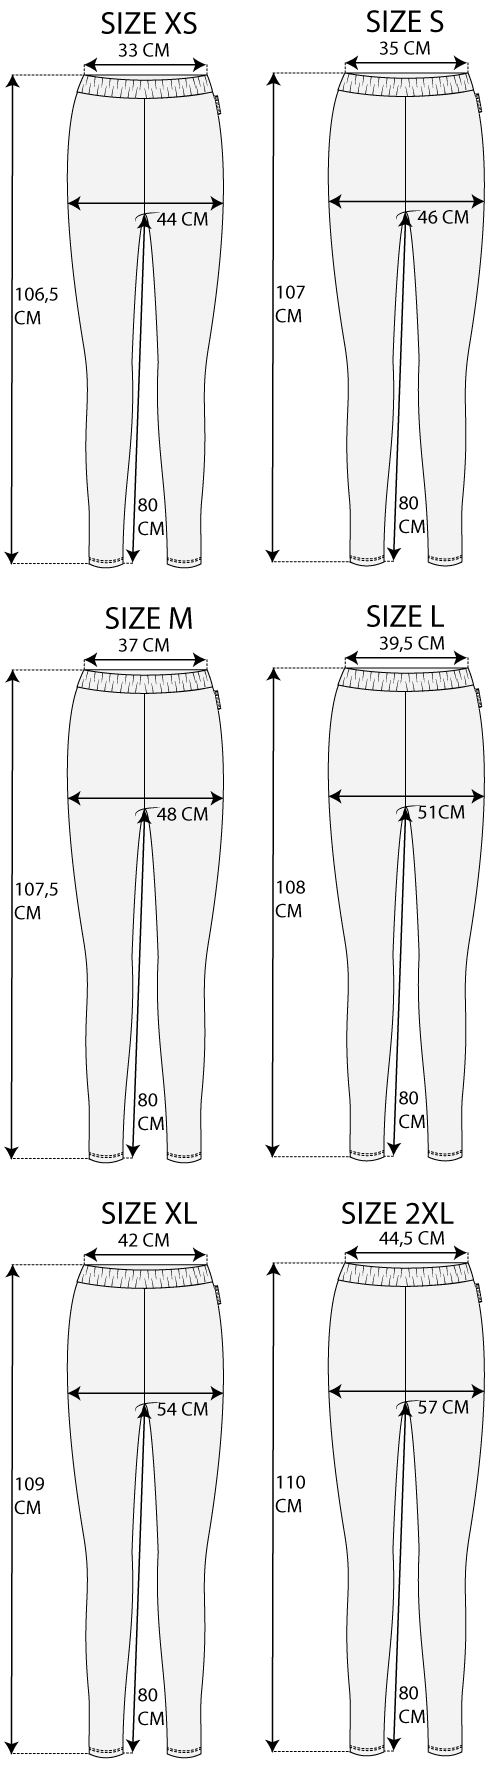 Maattabel Legging Travel